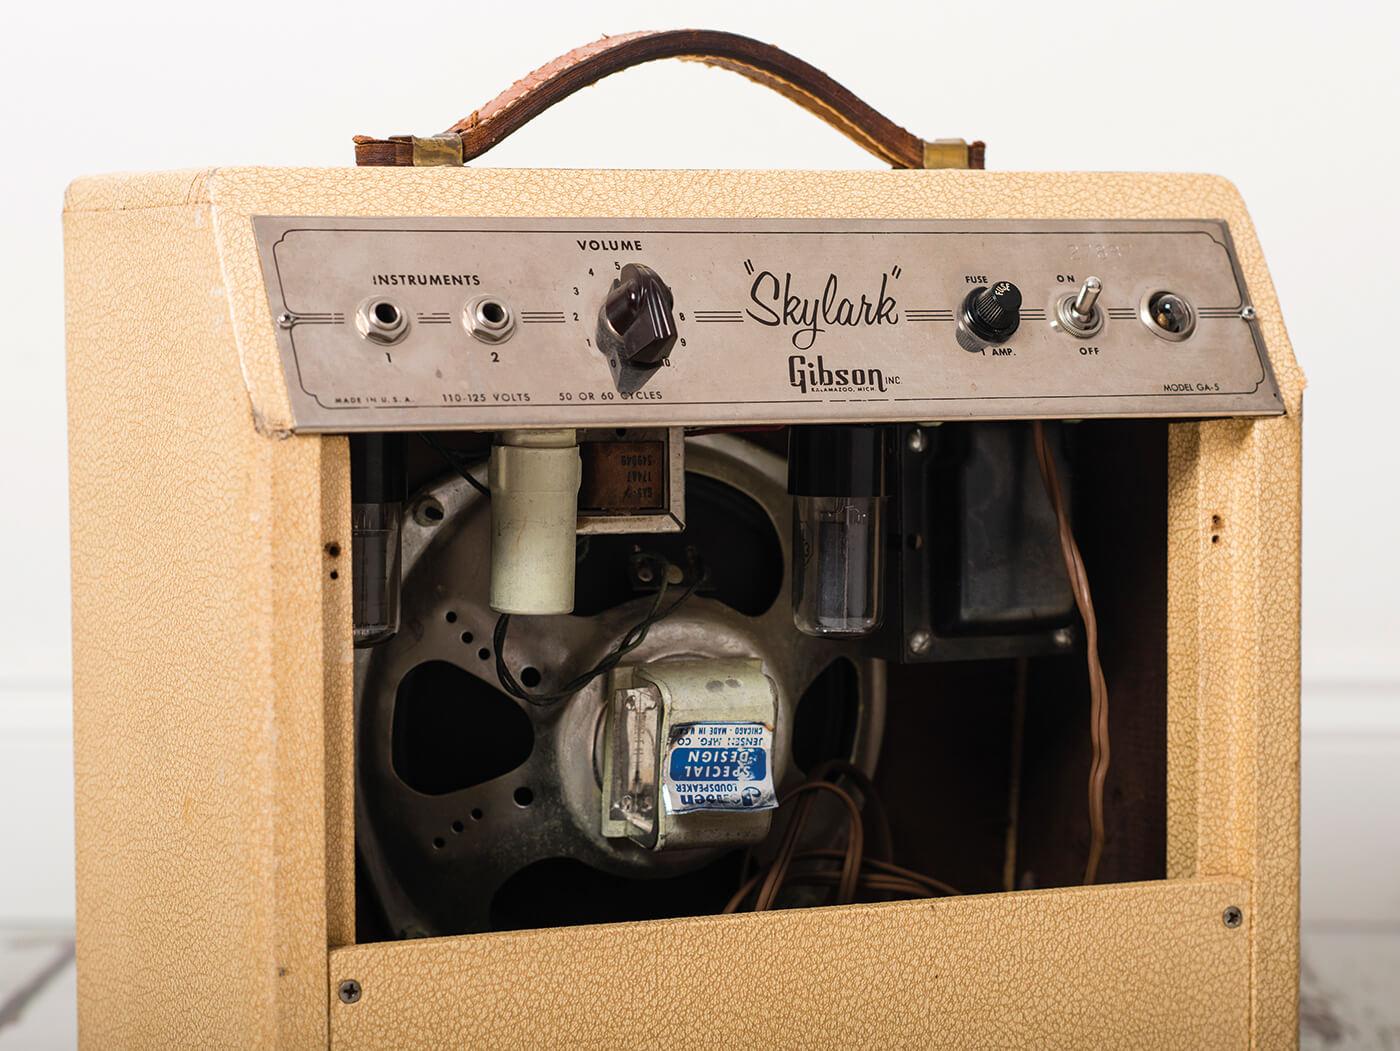 Gibson Skylark small vintage amp